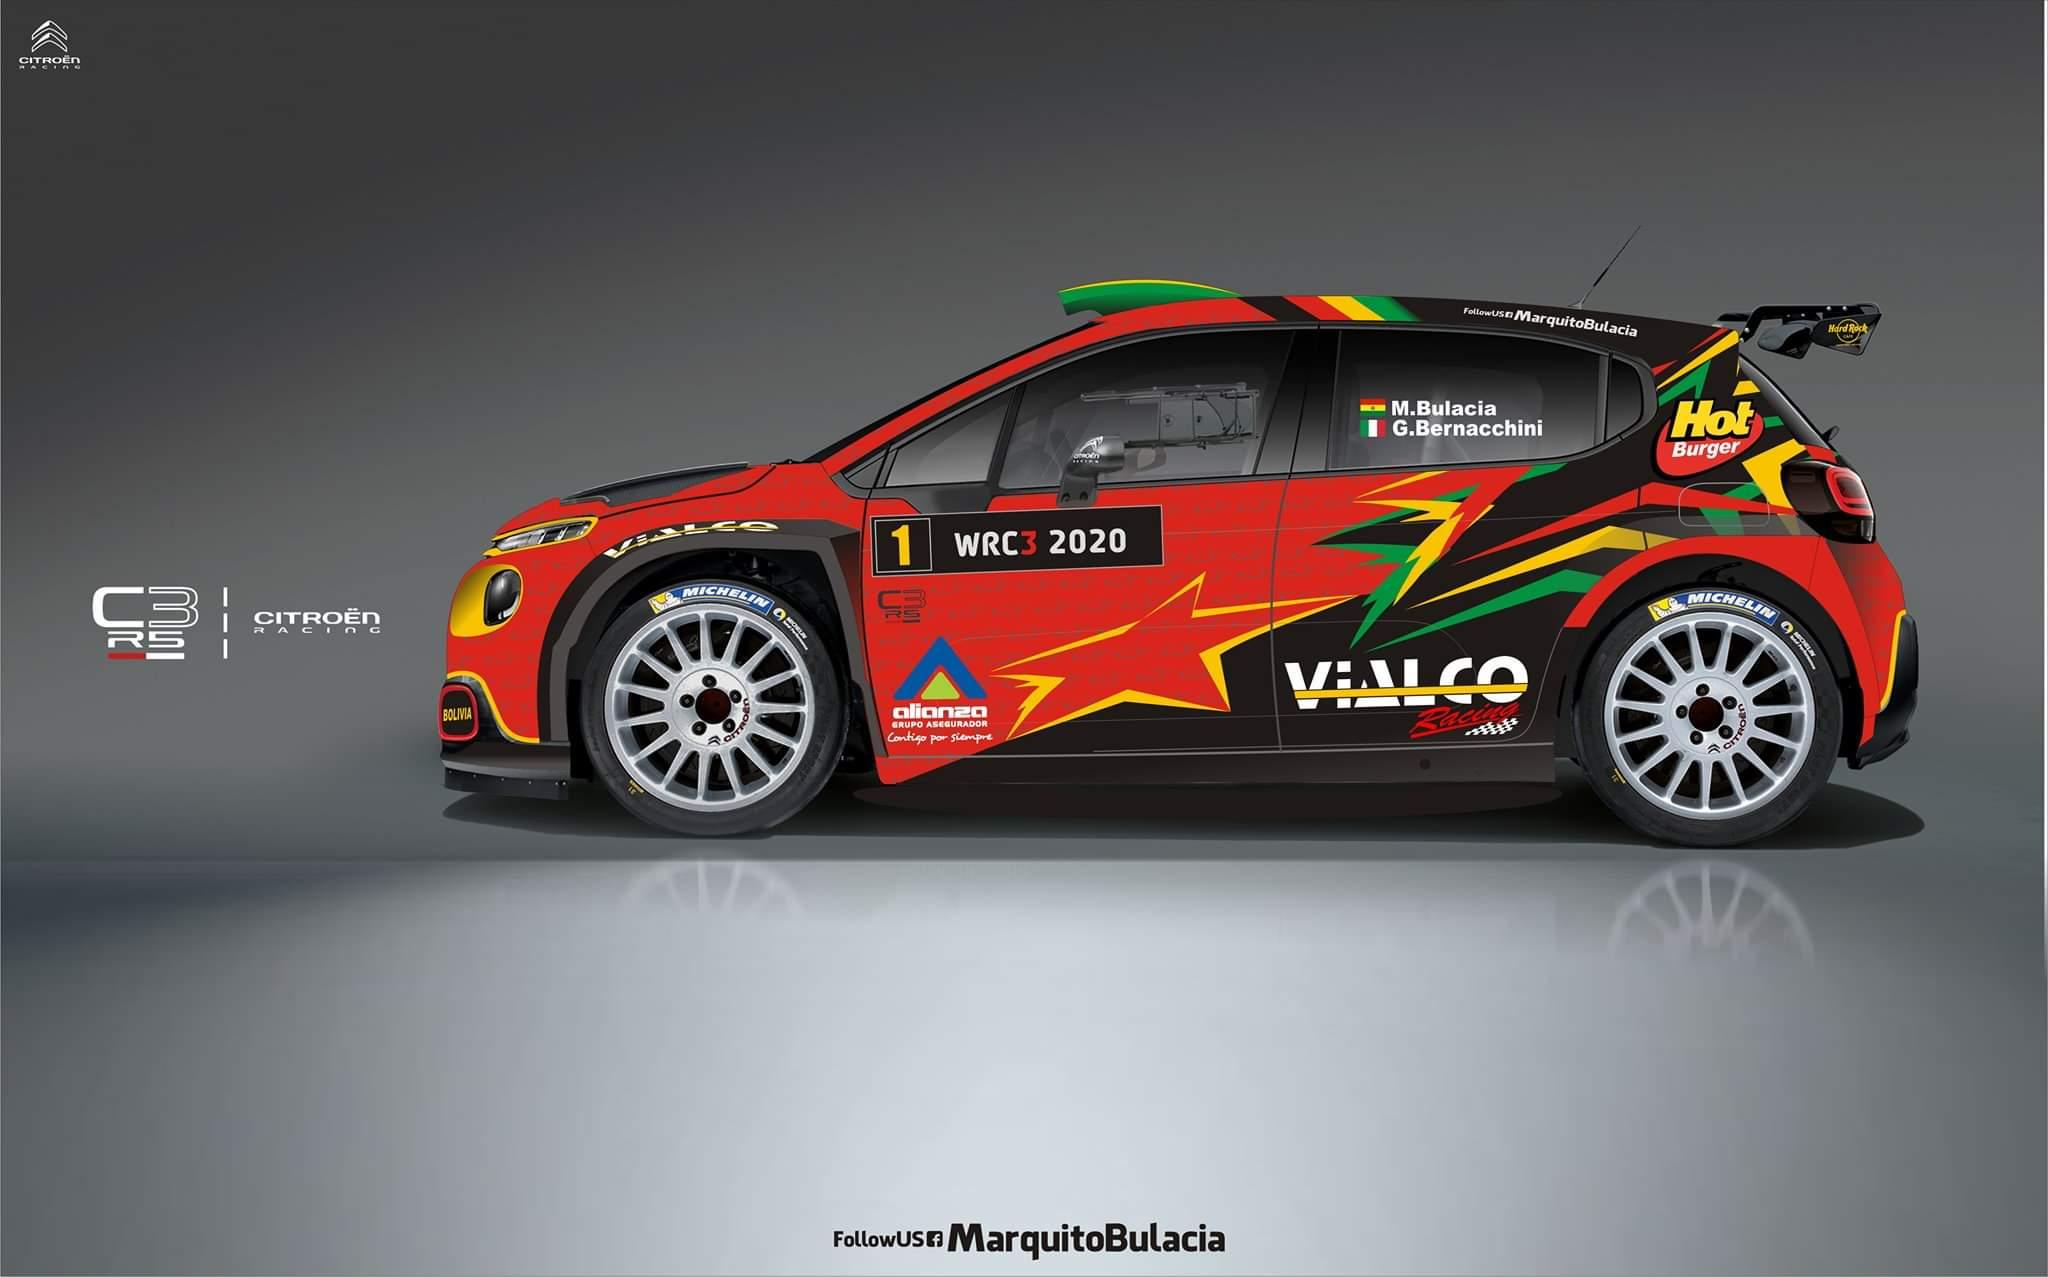 World Rally Championship: Temporada 2020 - Página 6 EOVhOmyX0AAaX0Y?format=jpg&name=4096x4096